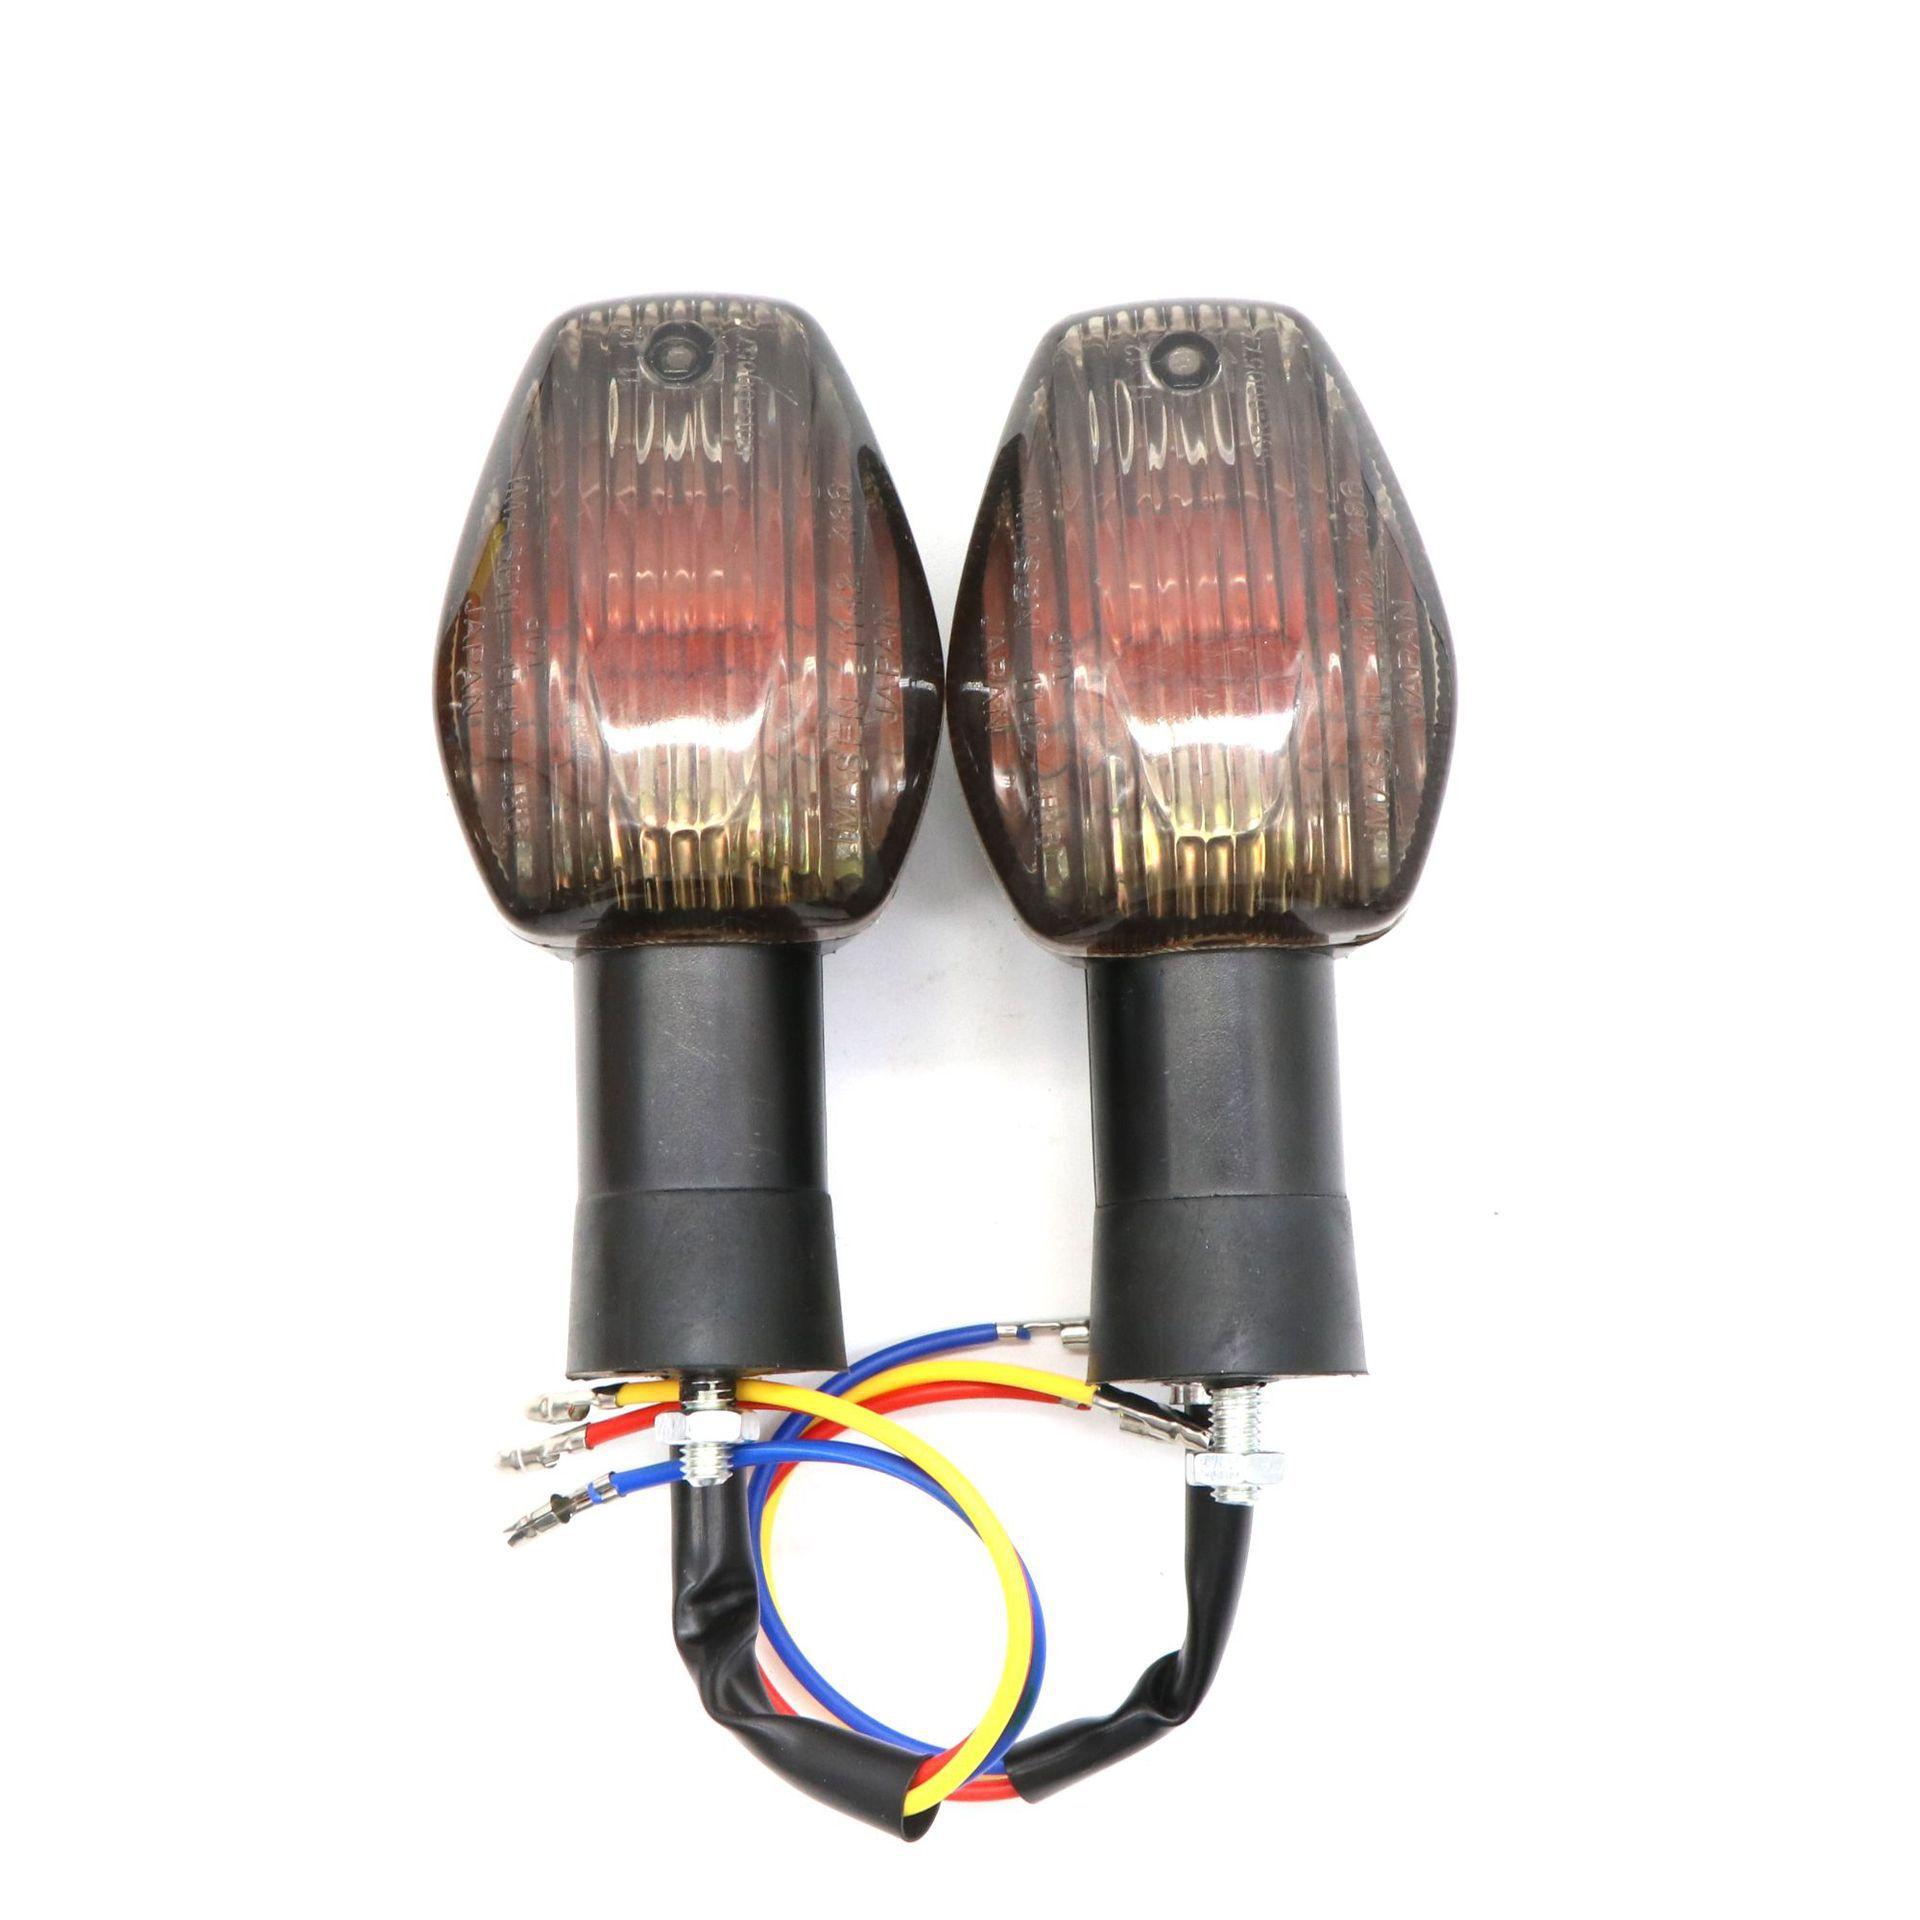 For HONDA CBR 600 CBR 1000RR CB 400 CB900 2002-2012 Motorcycle Modified Front Rear Turn Signal Indicator Warning Light Lamp Brown shell